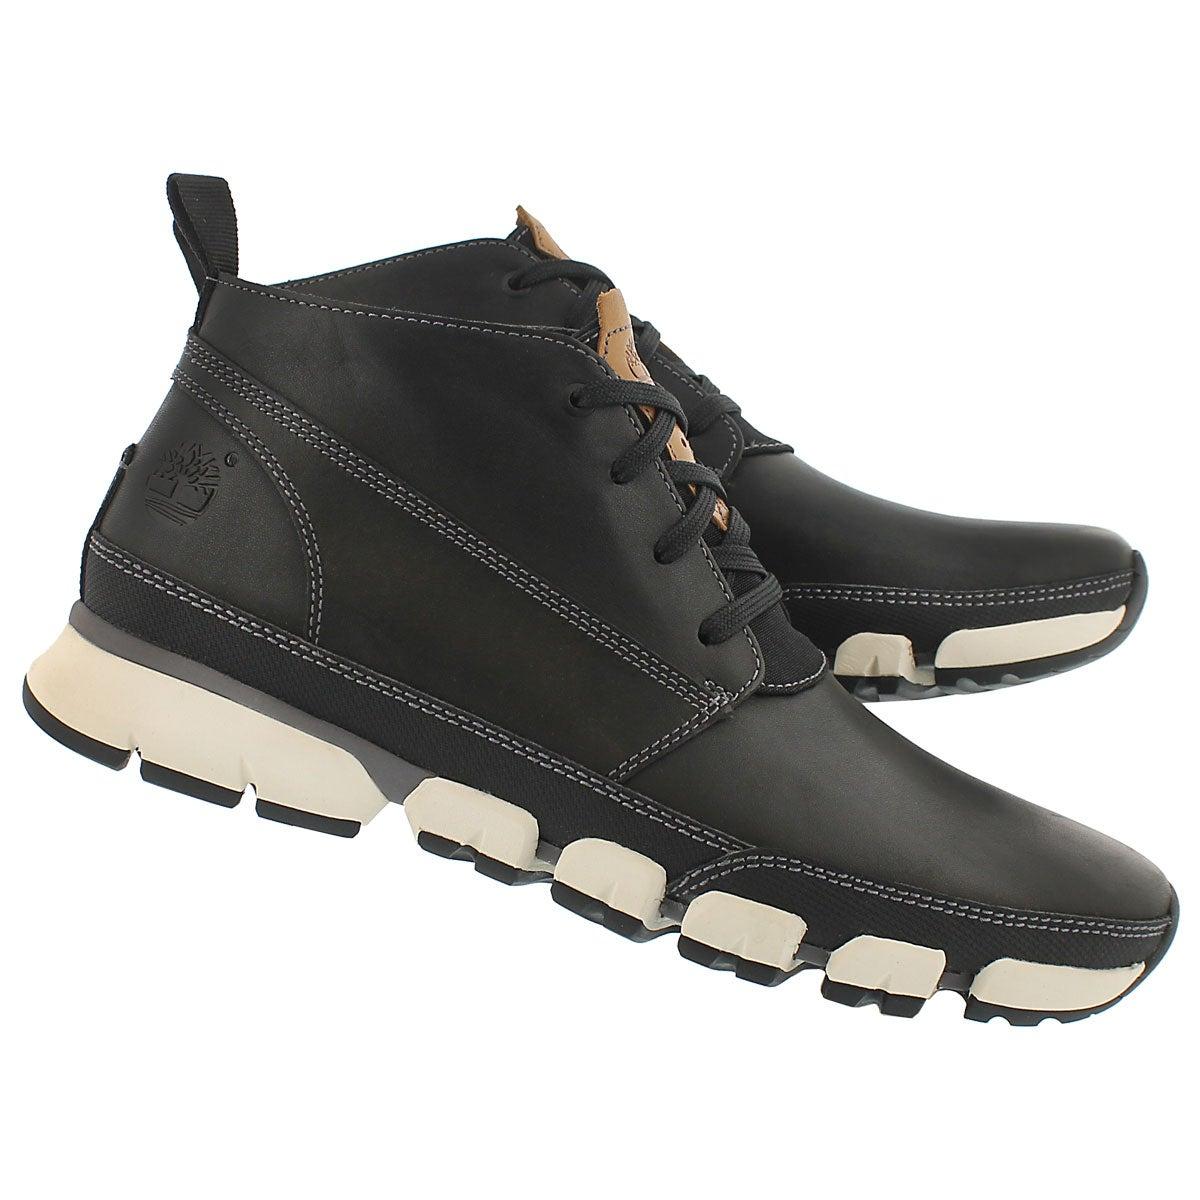 Mns Warf District blk laceup chukka boot